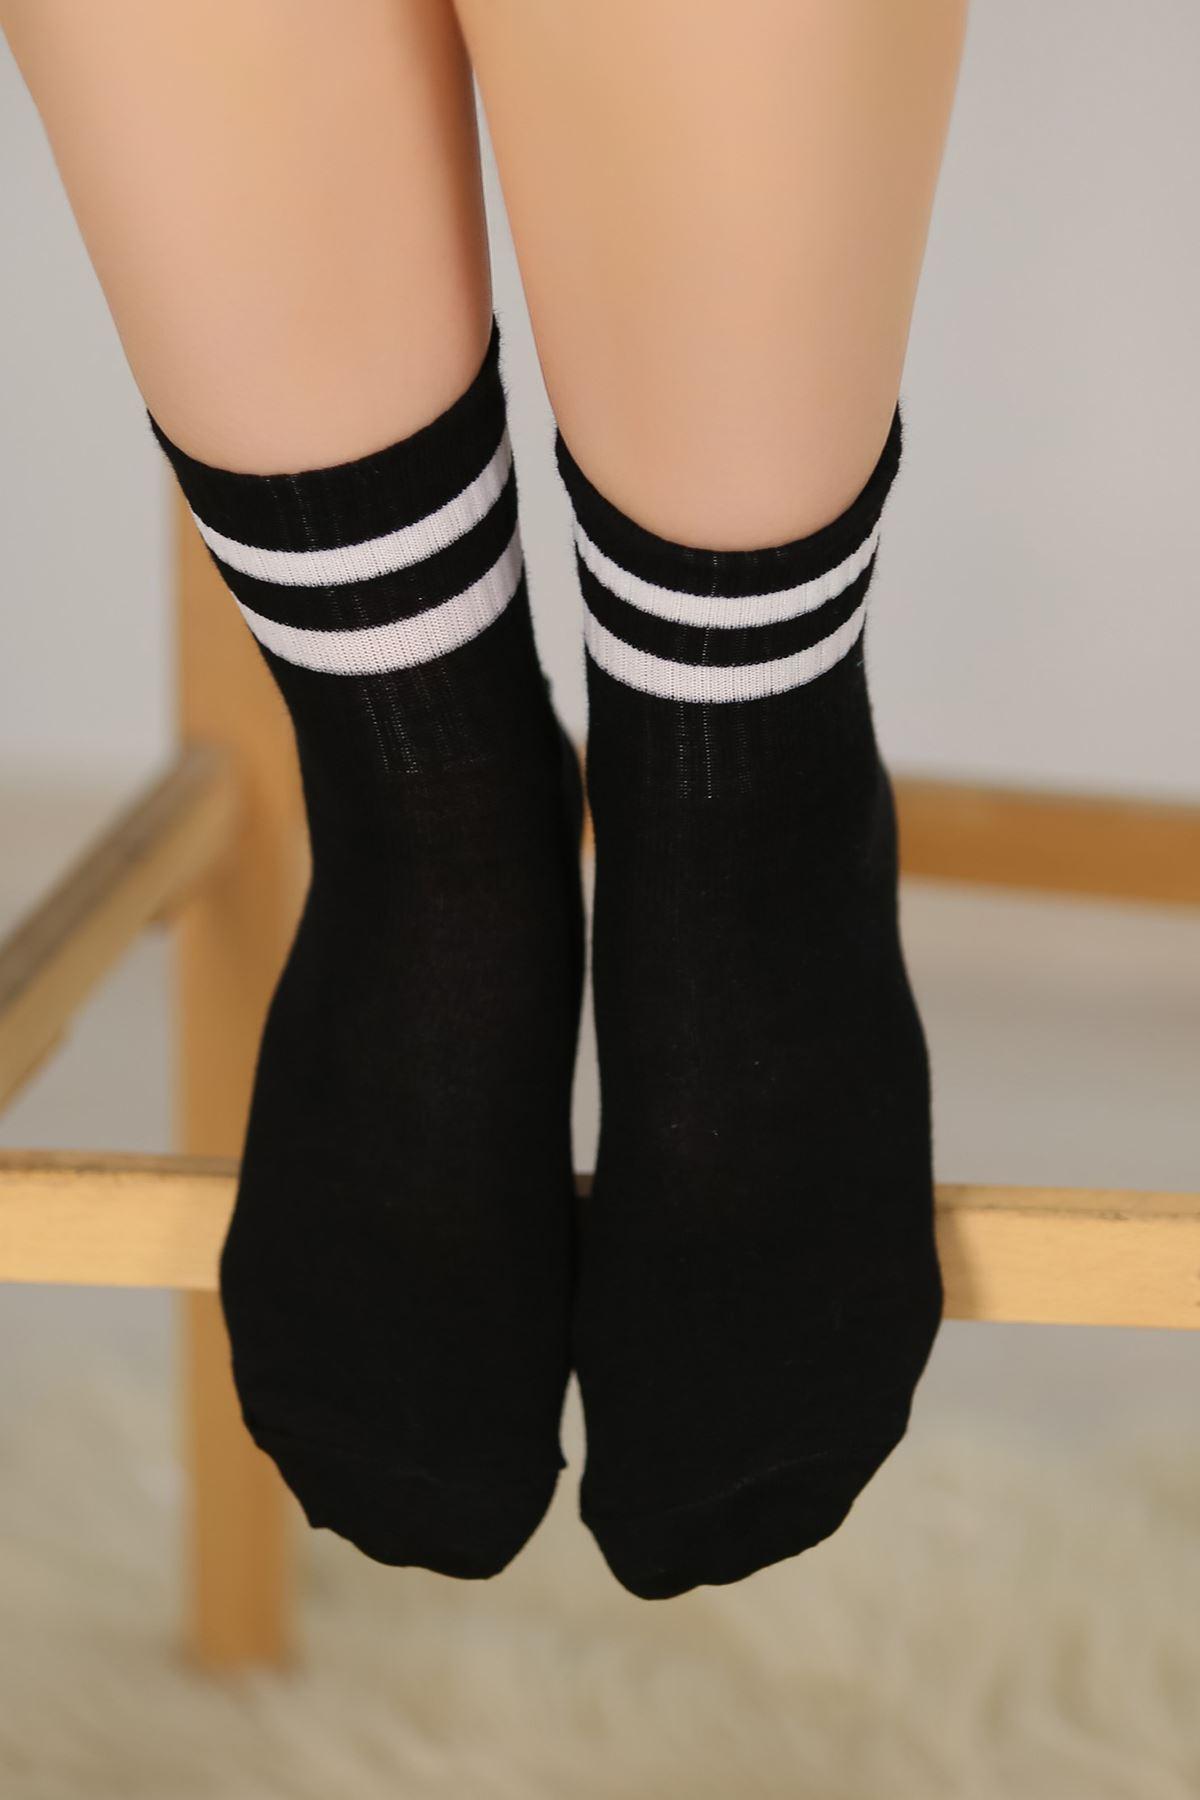 Soket Çorap Siyahçizgili - 10101.1114.